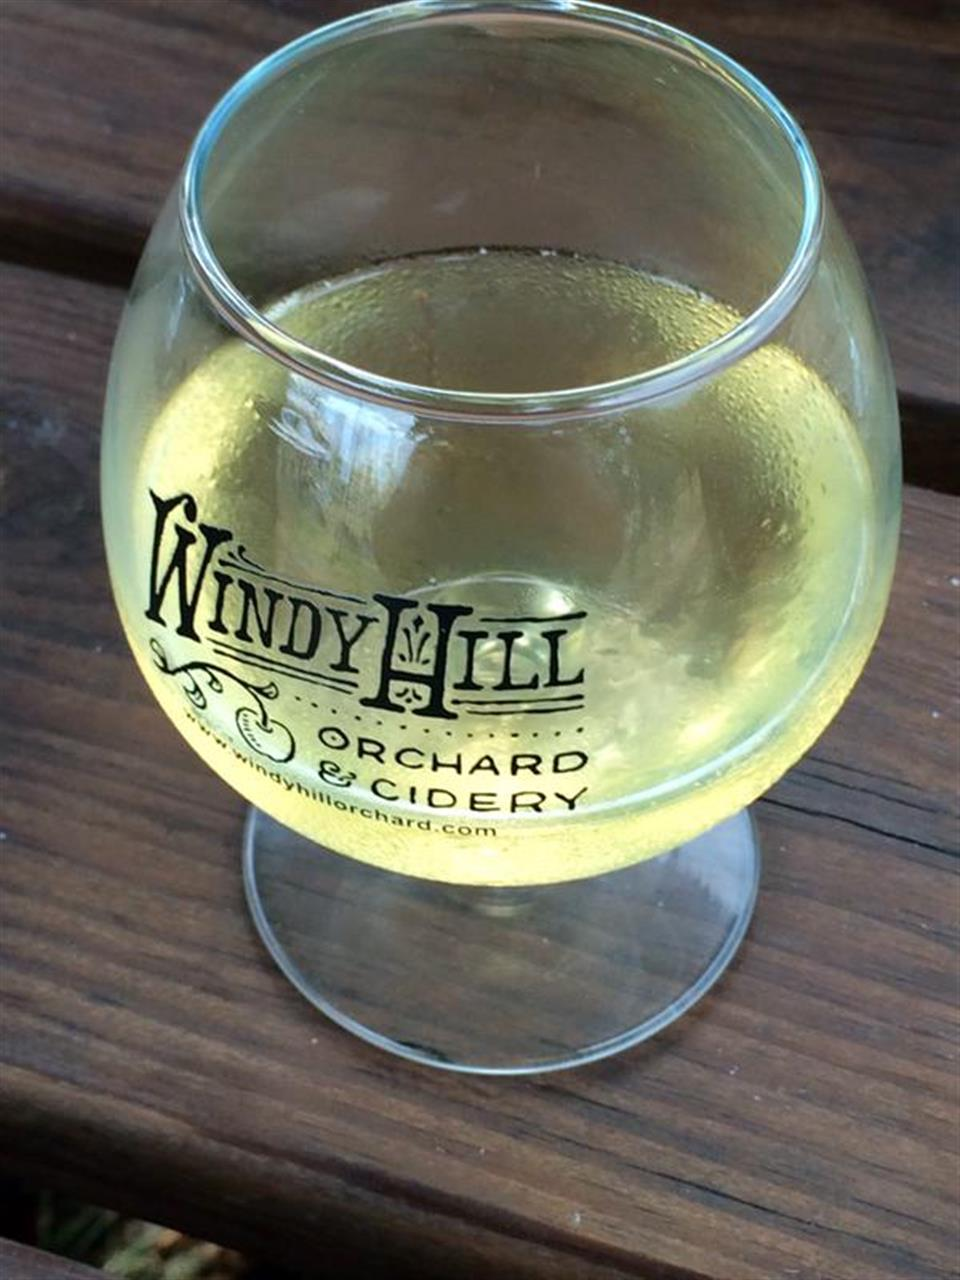 #DrinkLocalCider #WindyHillOrchard #York #SC #LeadingRElocal